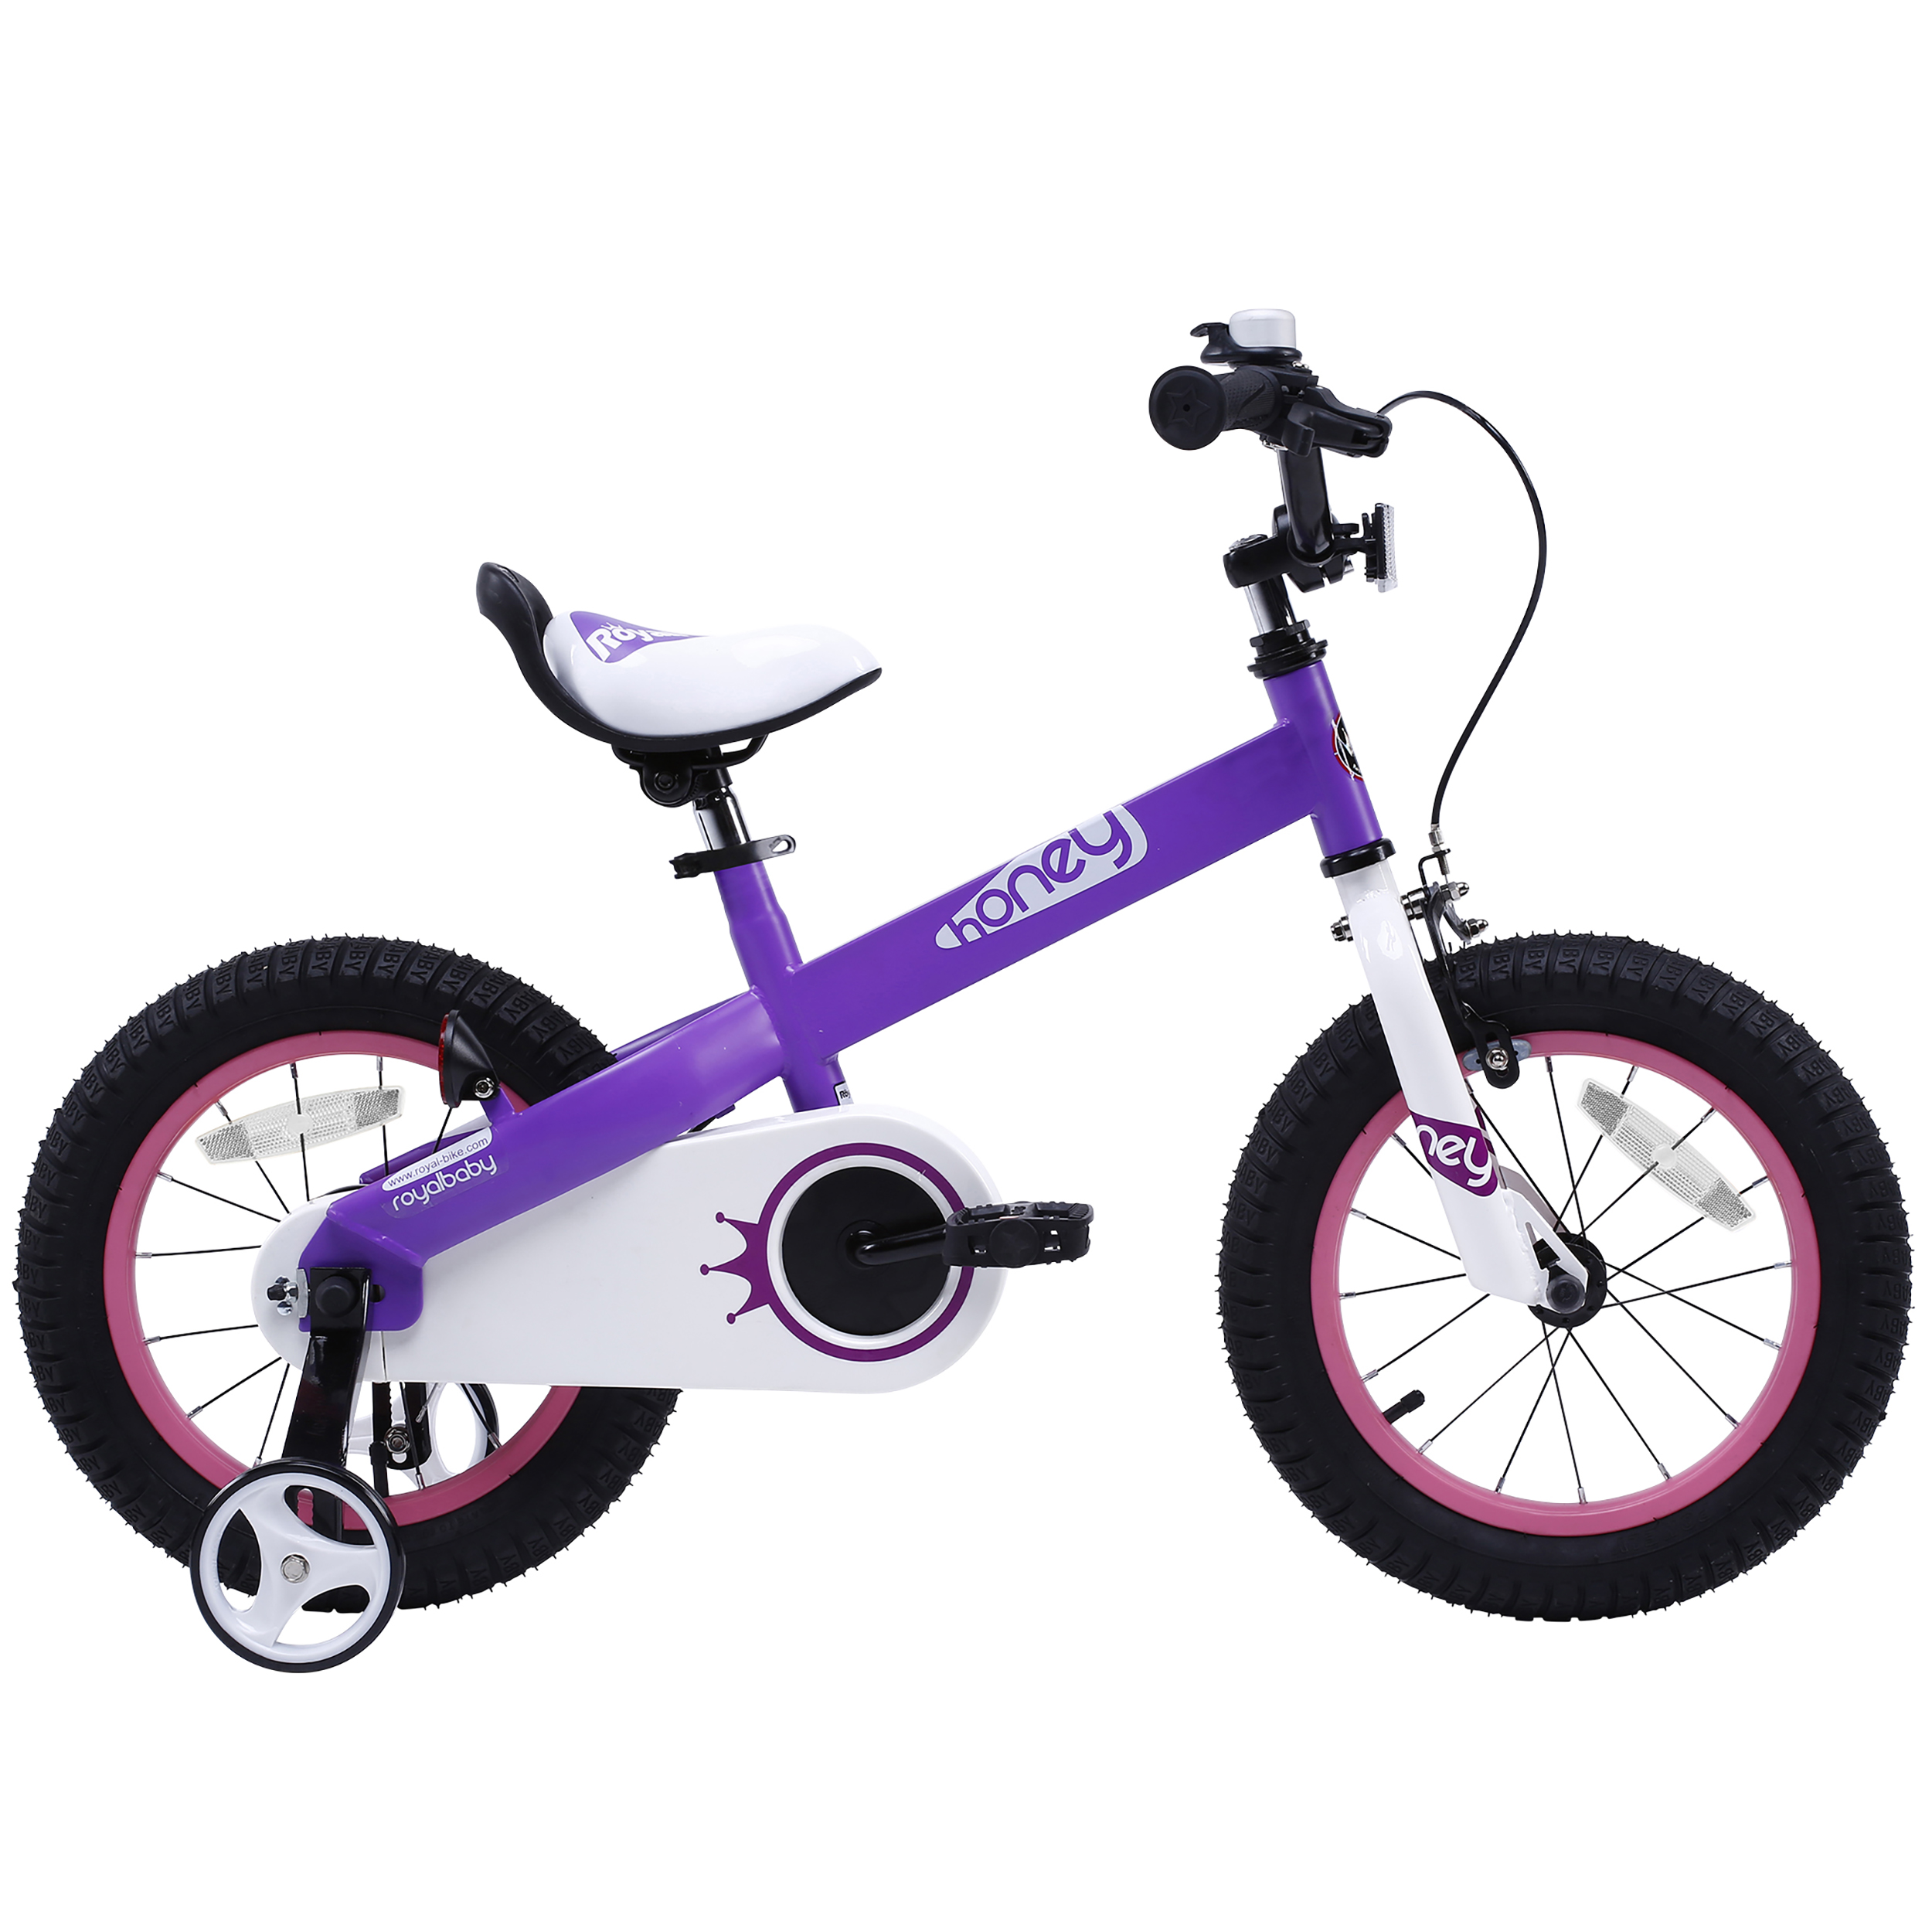 Royalbaby Honey Kid's Bike with training wheels, 16 inch bike for boys or girls PartNumber: 006VA96140612P MfgPartNumber: RB16-15H